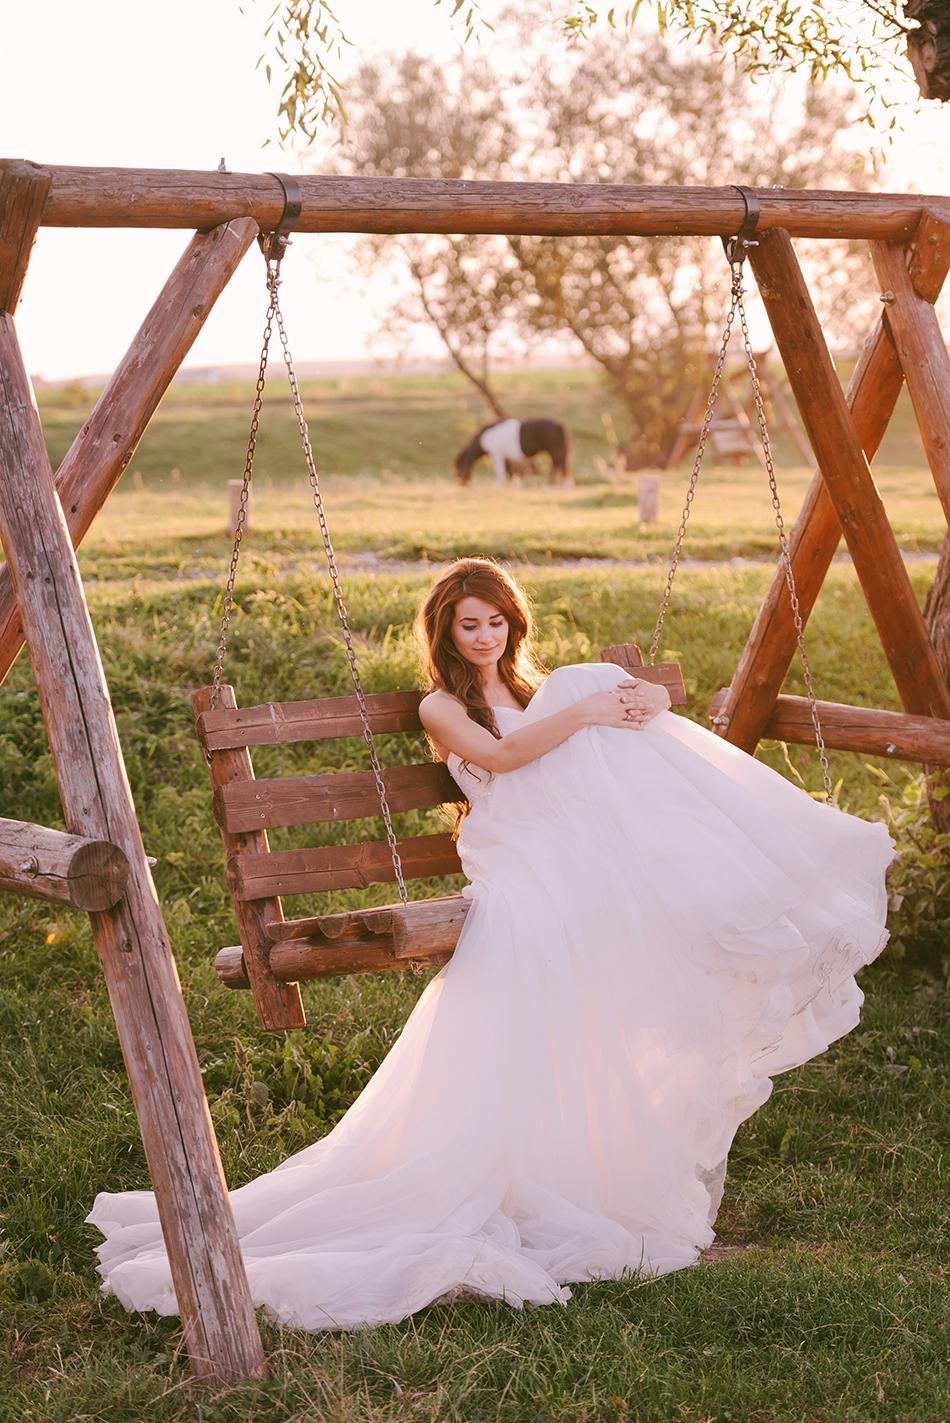 AD Passion Photography | fotograf-nunta-brasov-poiana-brasov-fotograf-profesionist_lorena-cristi_ttd_0083 | Adelin, Dida, fotograf profesionist, fotograf de nunta, fotografie de nunta, fotograf Timisoara, fotograf Craiova, fotograf Bucuresti, fotograf Arad, nunta Timisoara, nunta Arad, nunta Bucuresti, nunta Craiova